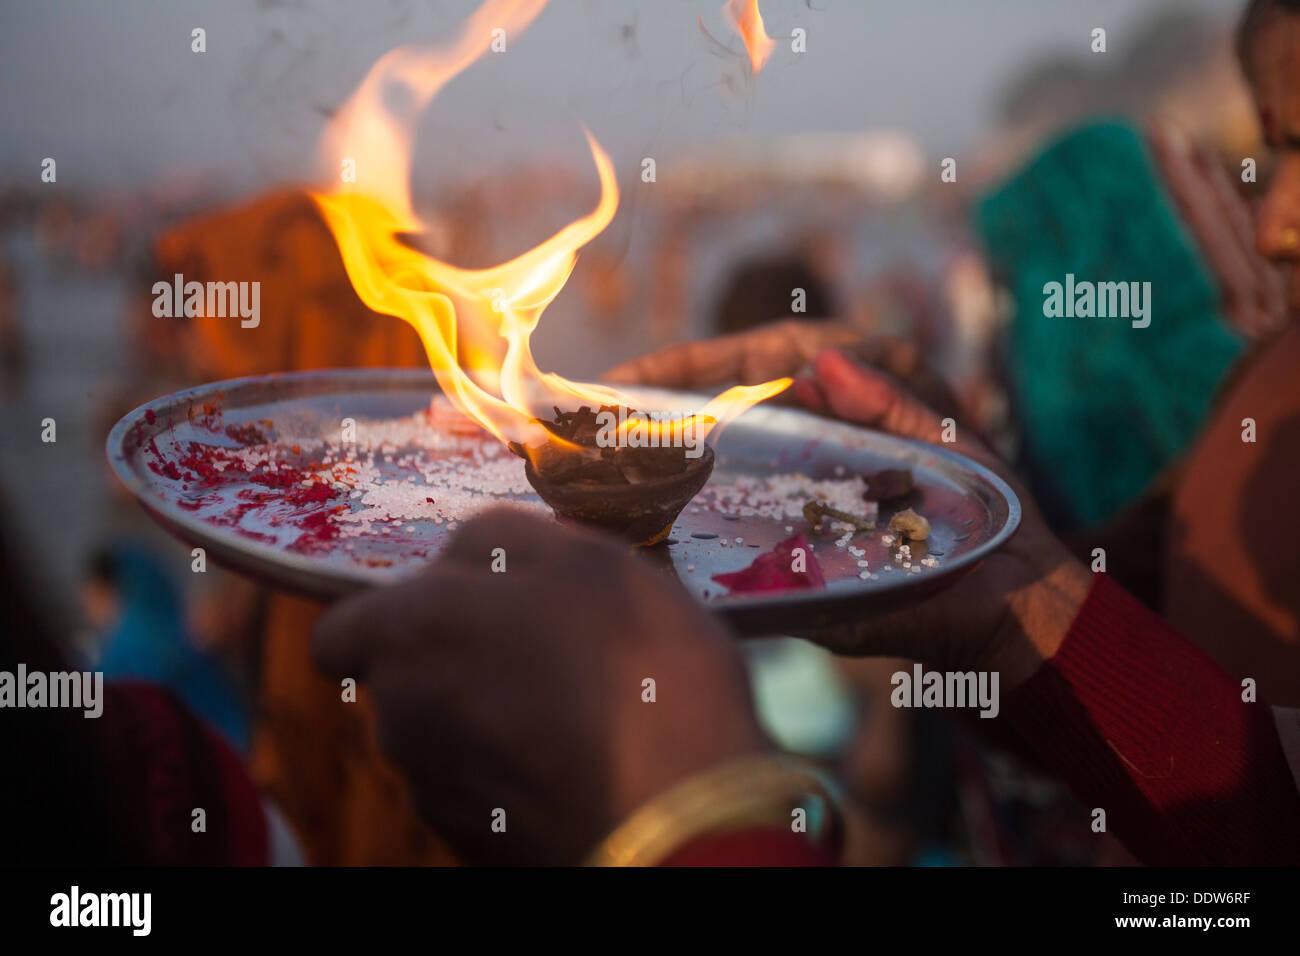 Devotes and Pilgrims taking holy dip in Ganga during the auspicious day at Kumbh Mela 2013, Allahabad, UP India Stock Photo